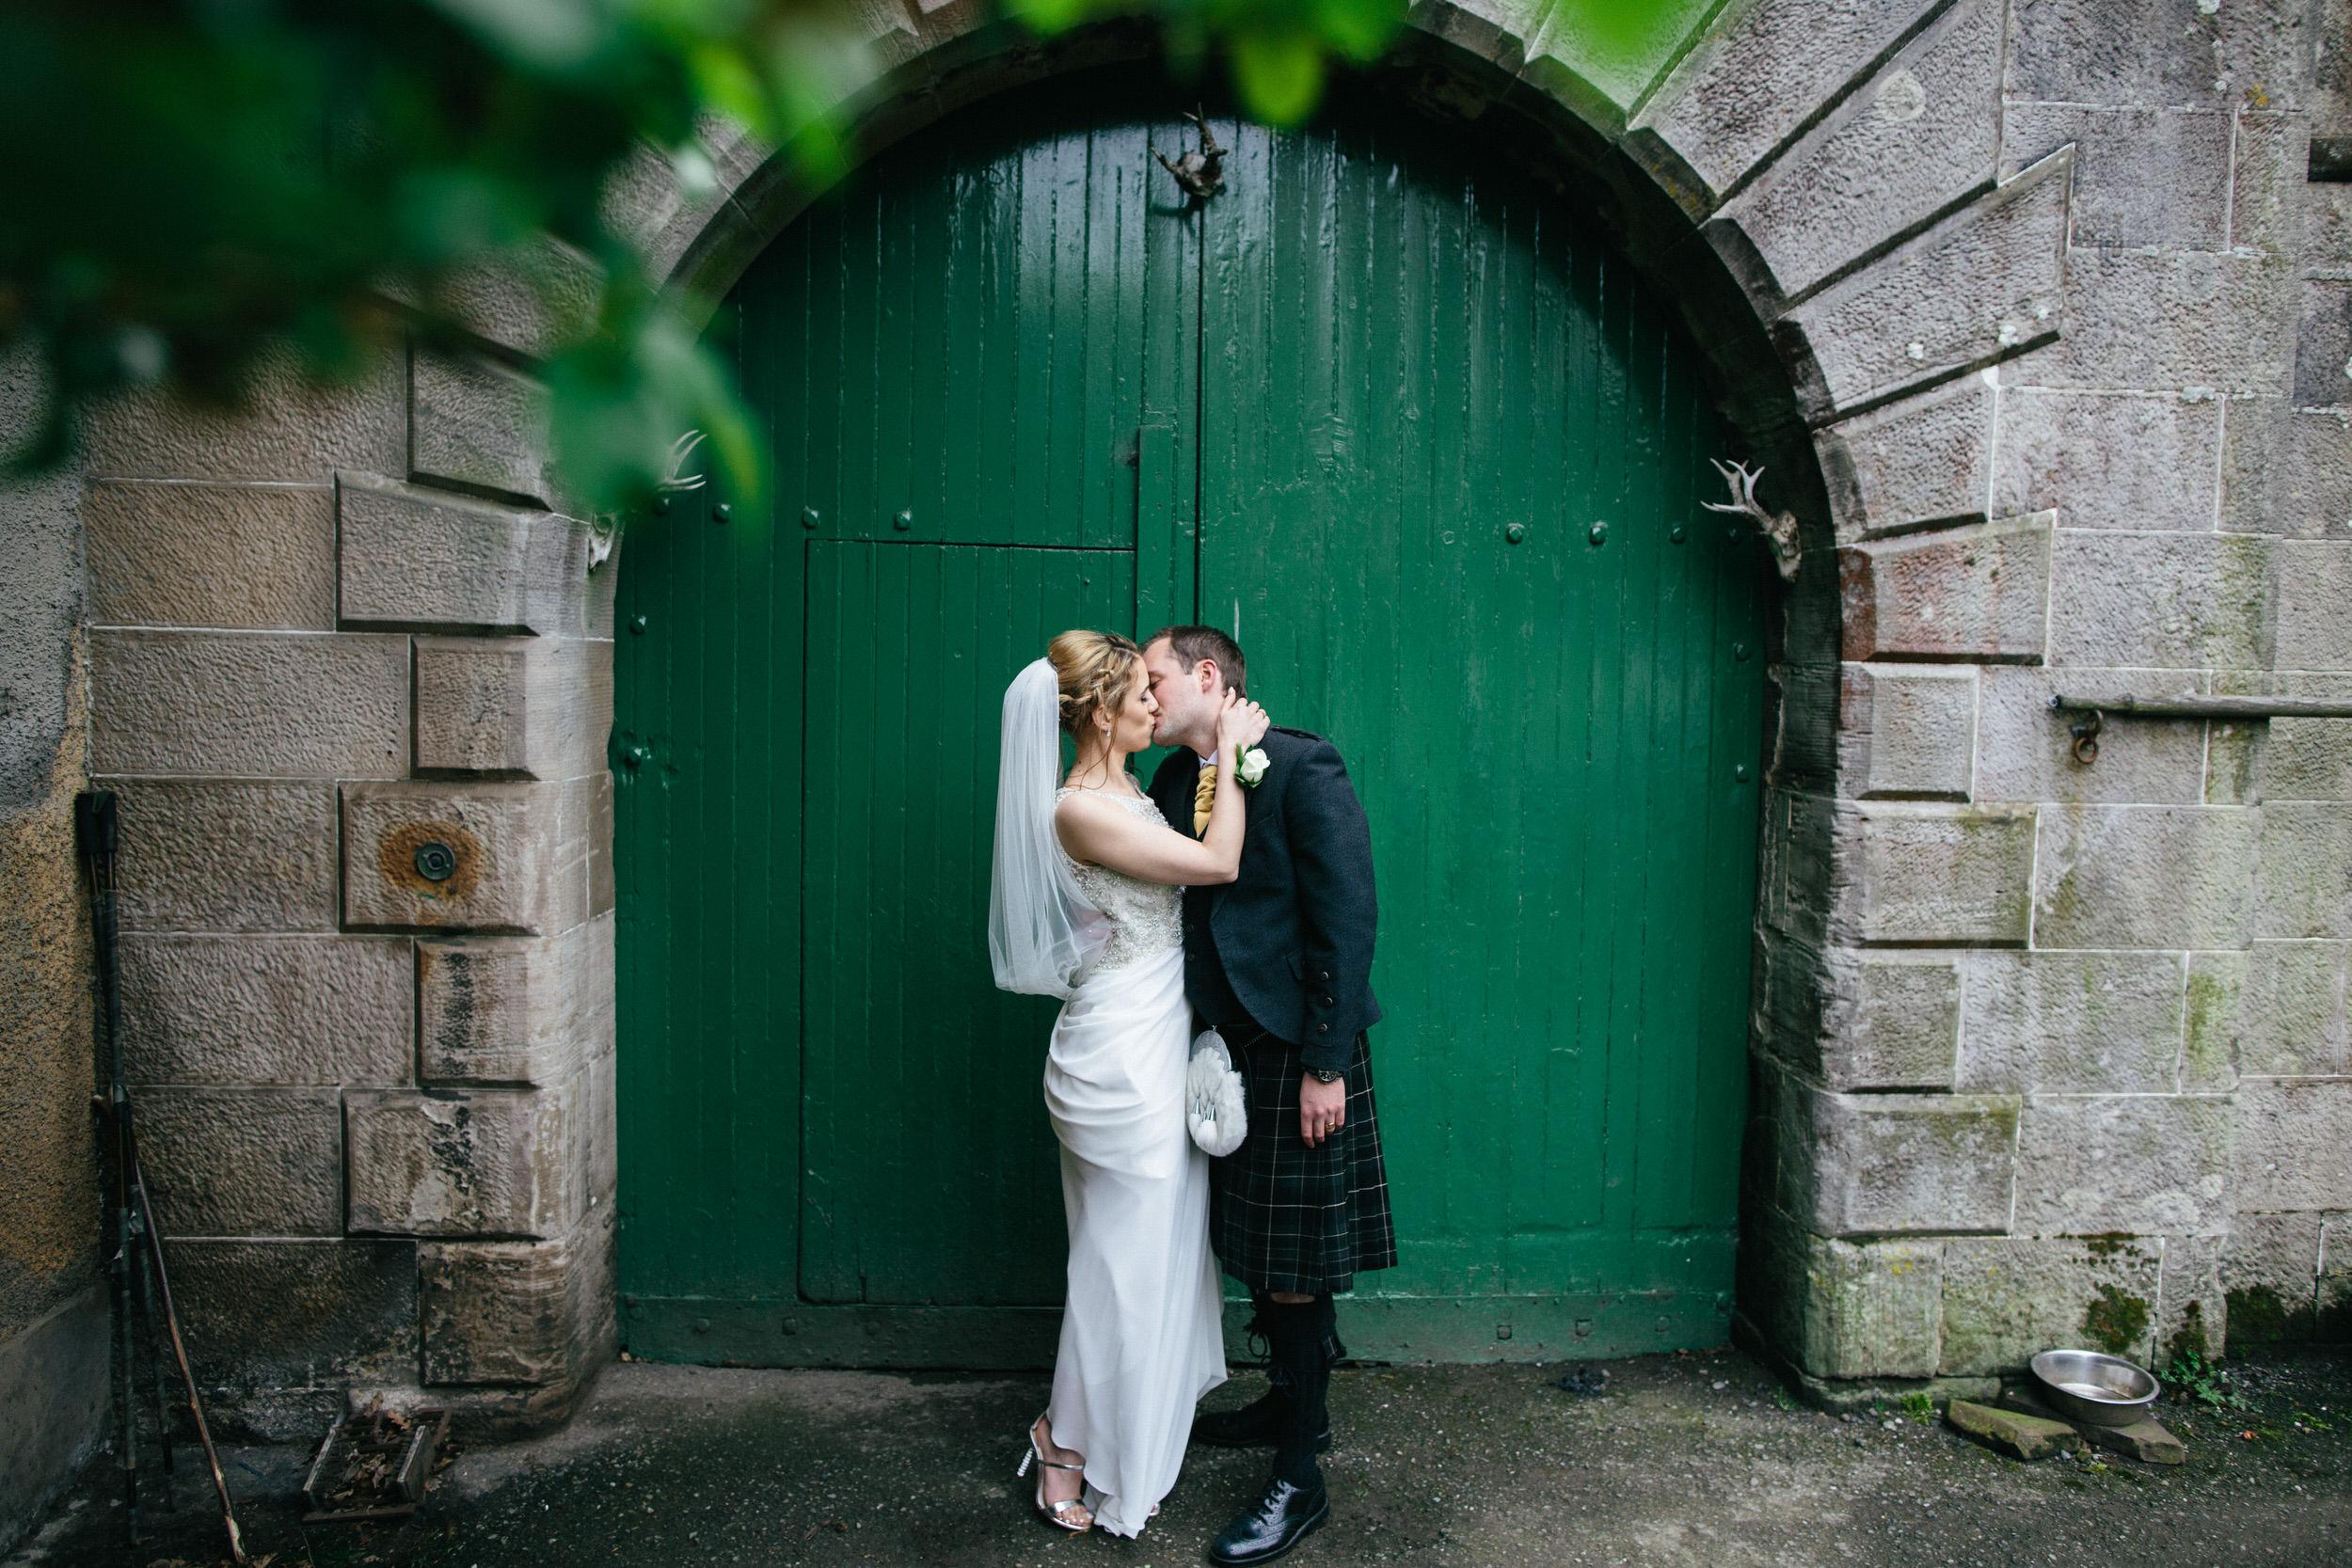 Quirky Wedding Photographer Scotland Glasgow Edinburgh Mirrorbox 089.jpg